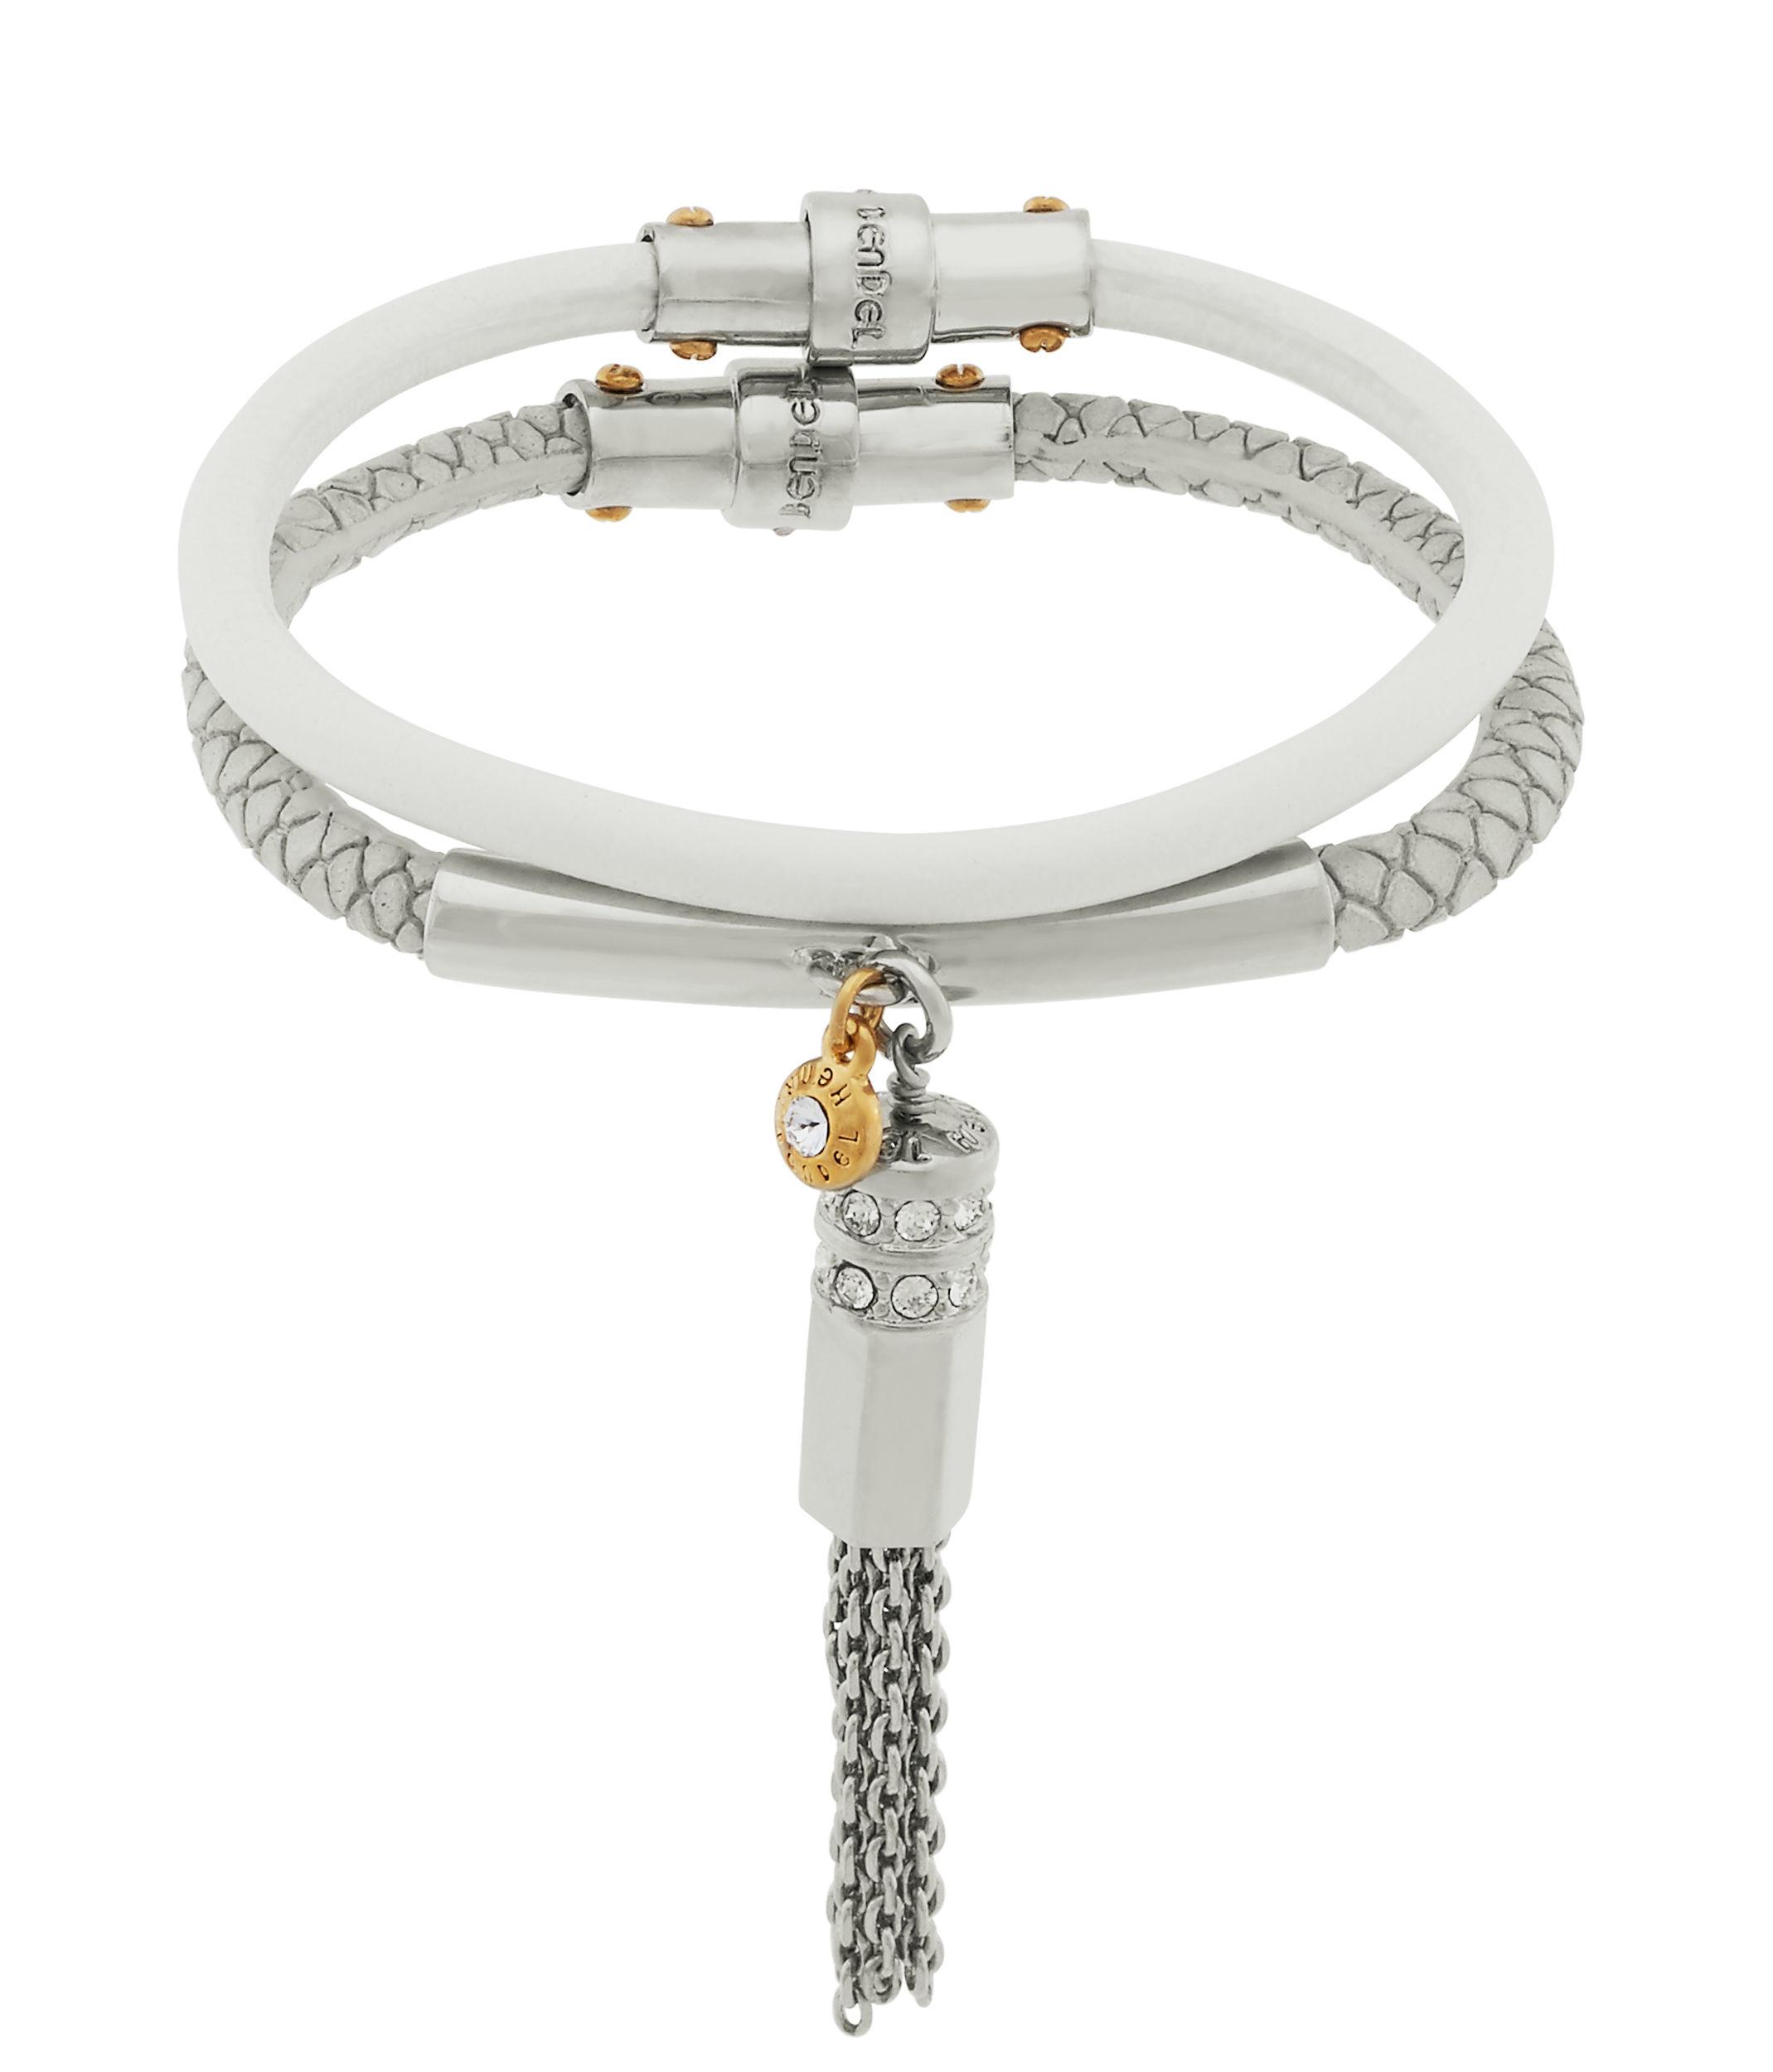 ec0bfc56a30c6 Lyst - Henri Bendel Double Charm Bracelet Set in Metallic